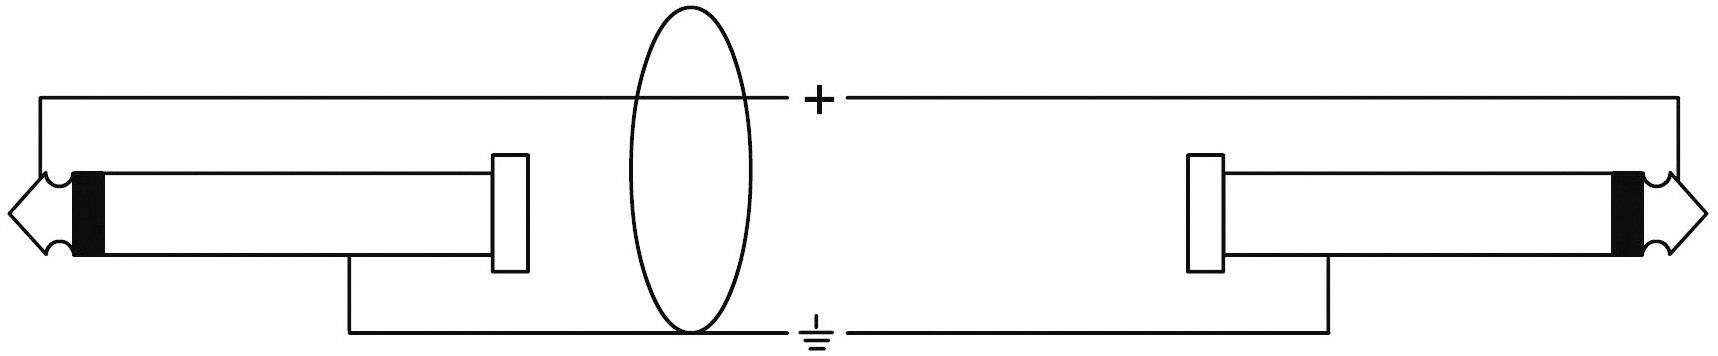 Kábel Cordial CPL 10 PP, [1x jack zástrčka 6,35 mm - 1x jack zástrčka 6,35 mm], 10 m, čierna